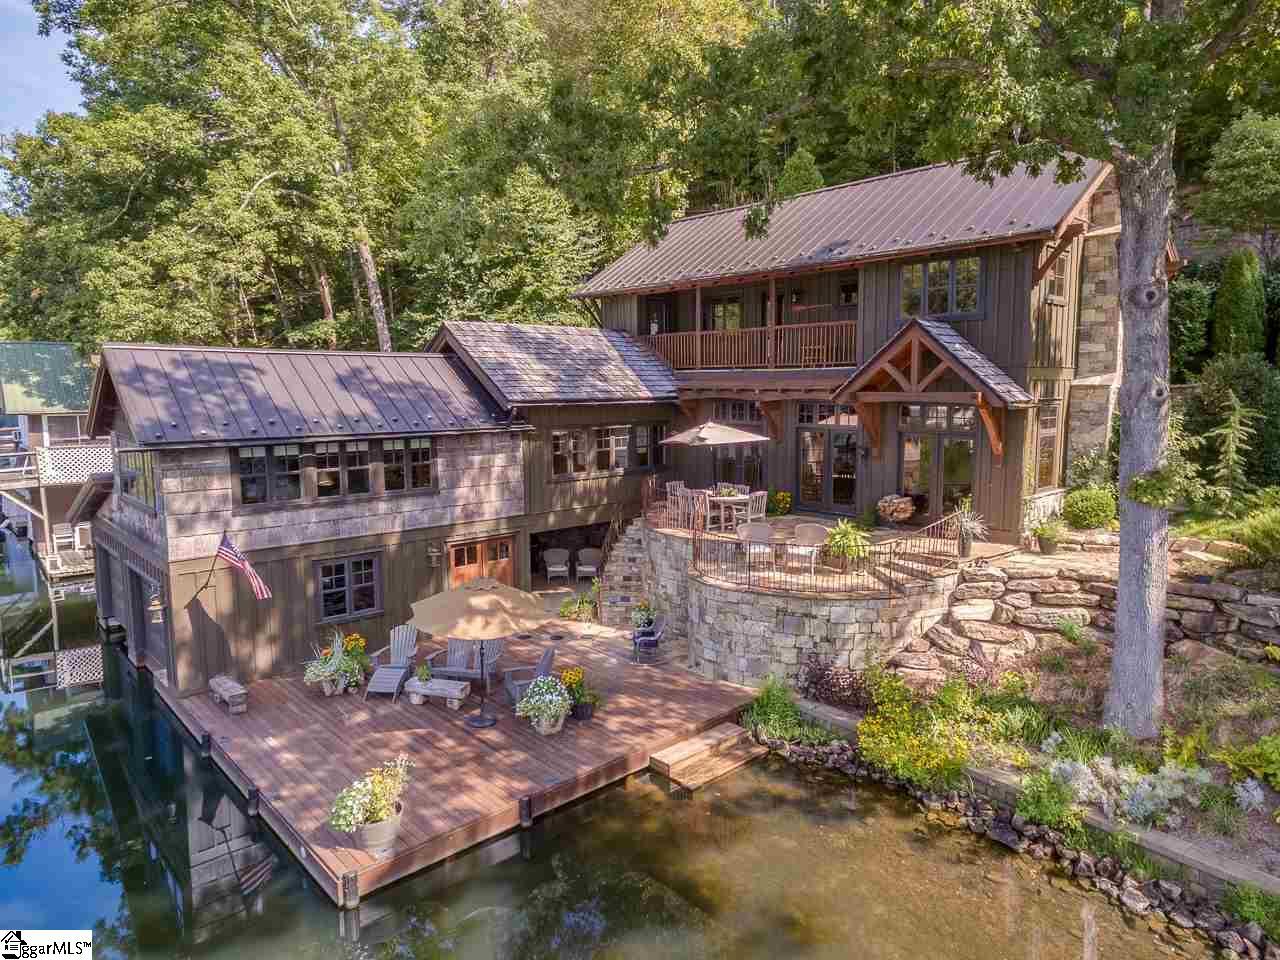 Greenville 3 Bedroom Home For Sale